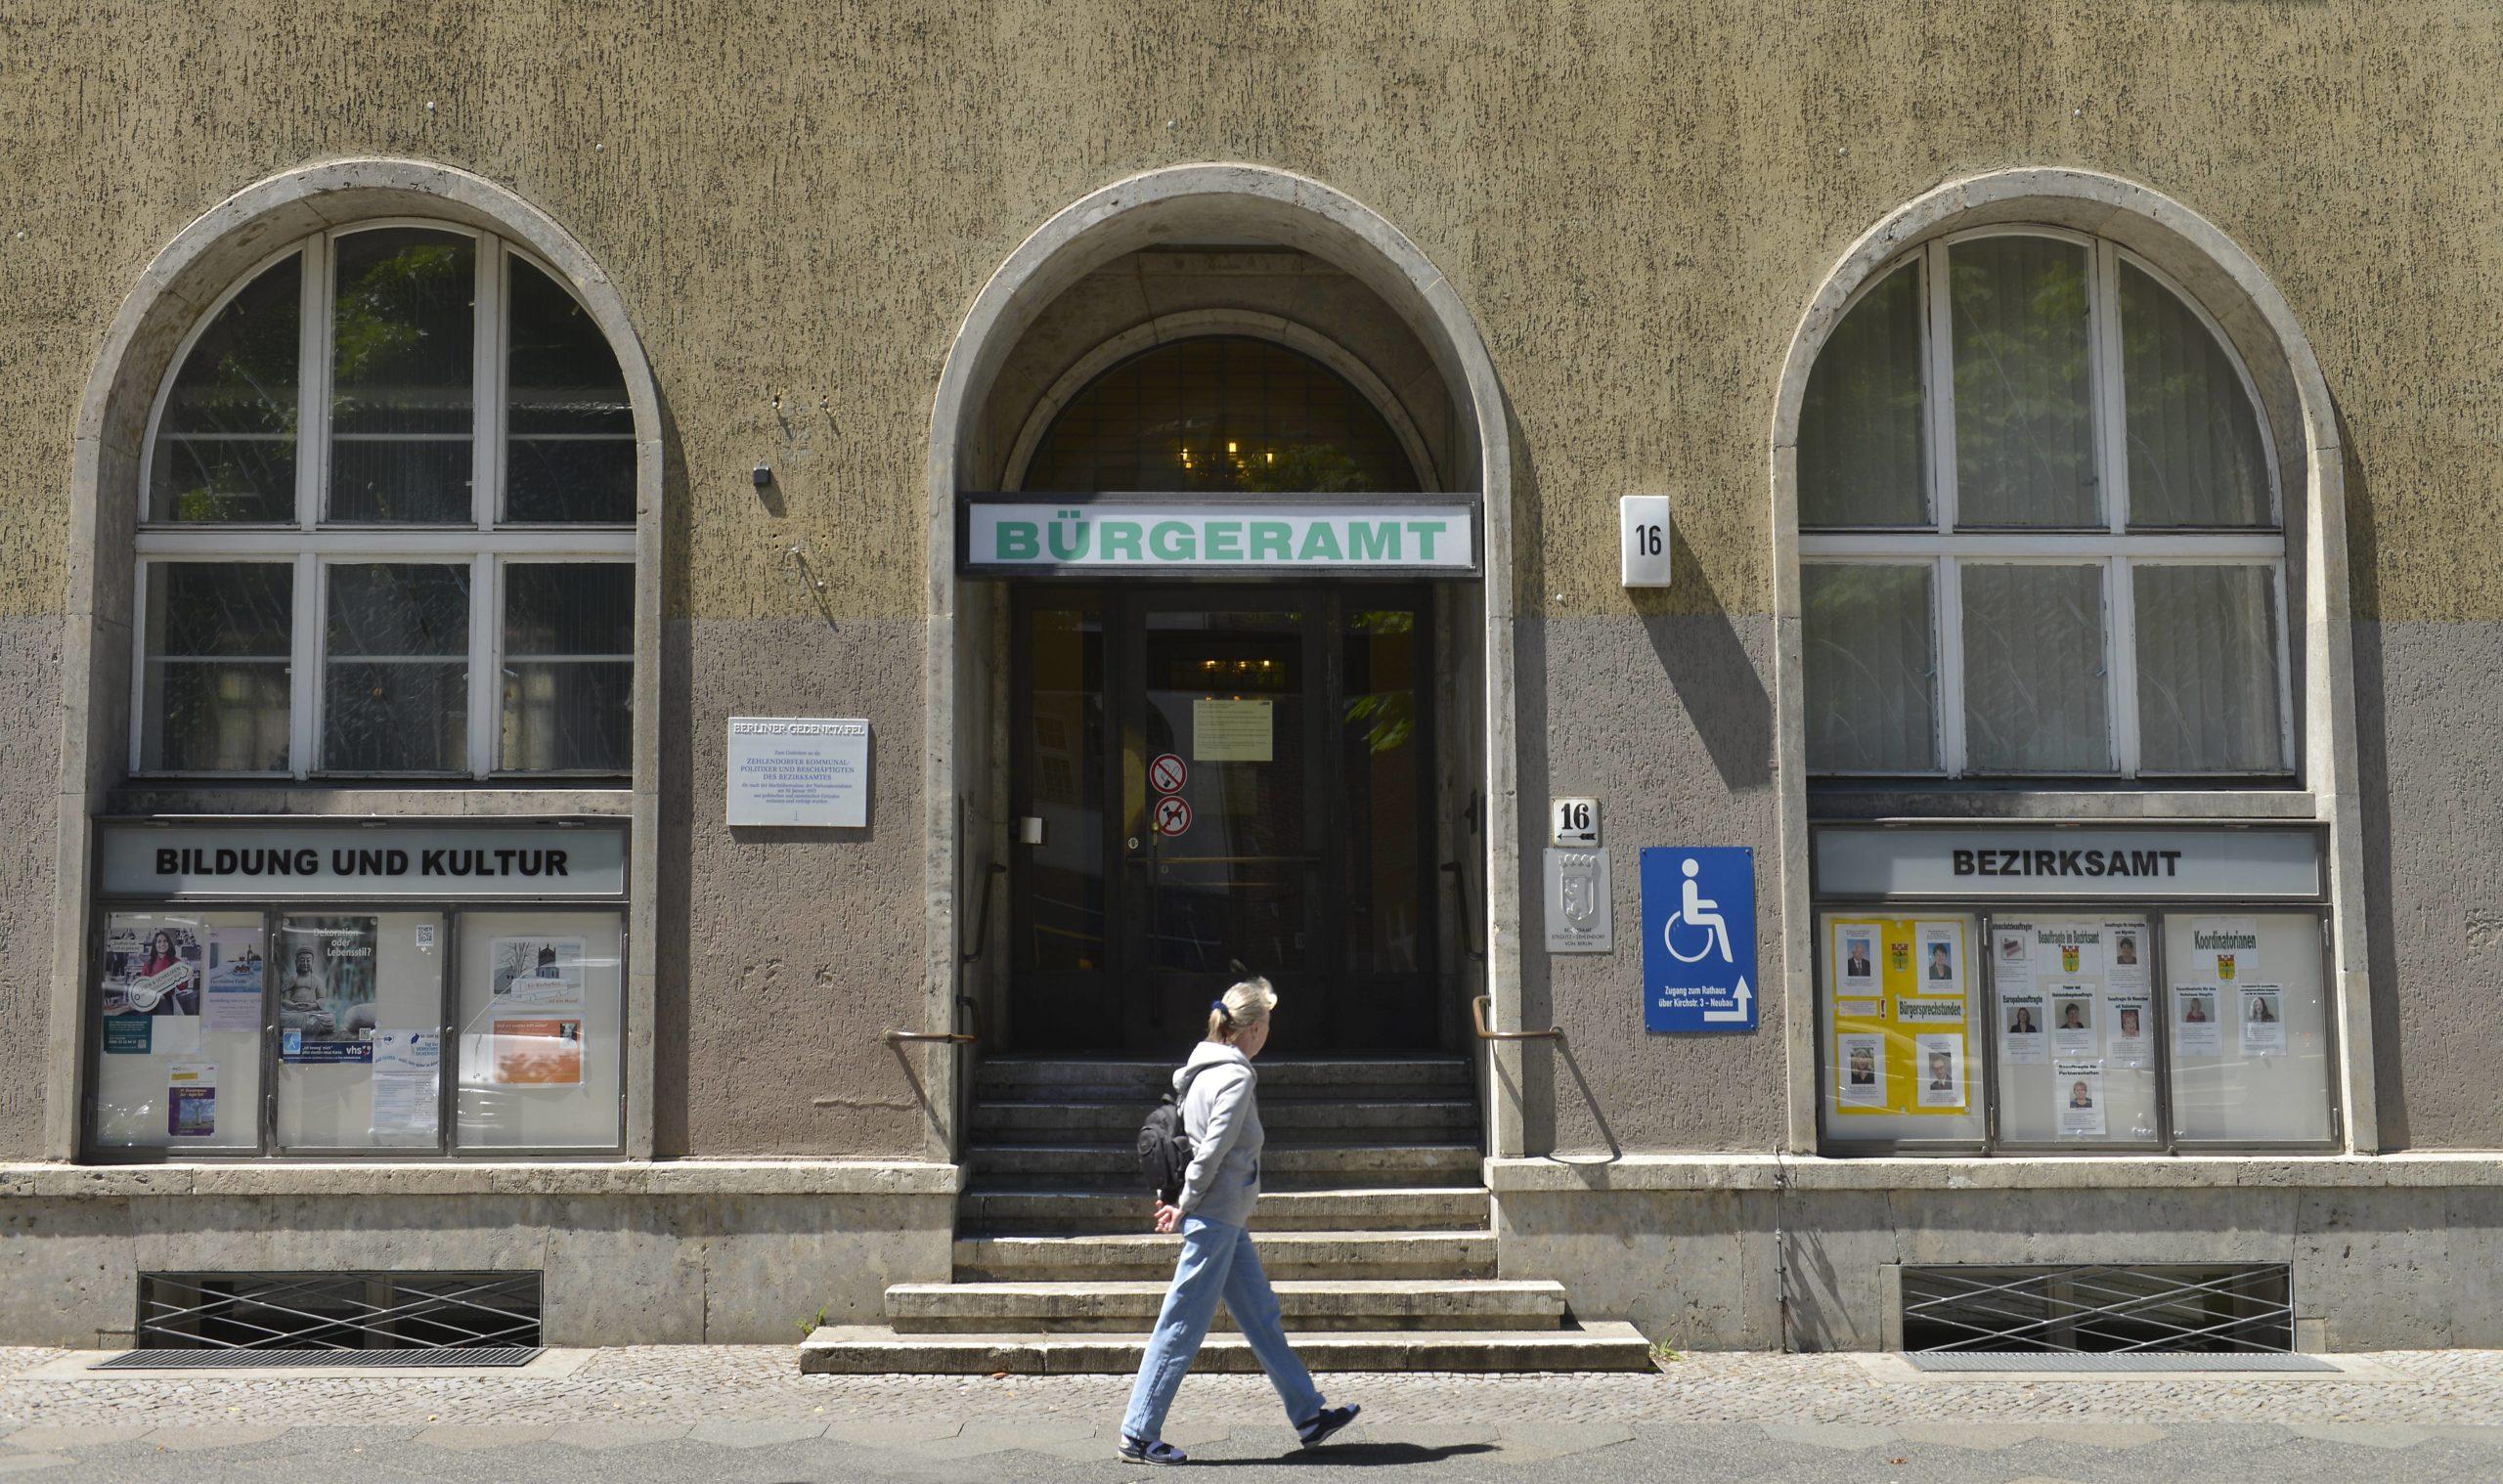 Bürgeramt Berlin Ohne Termin